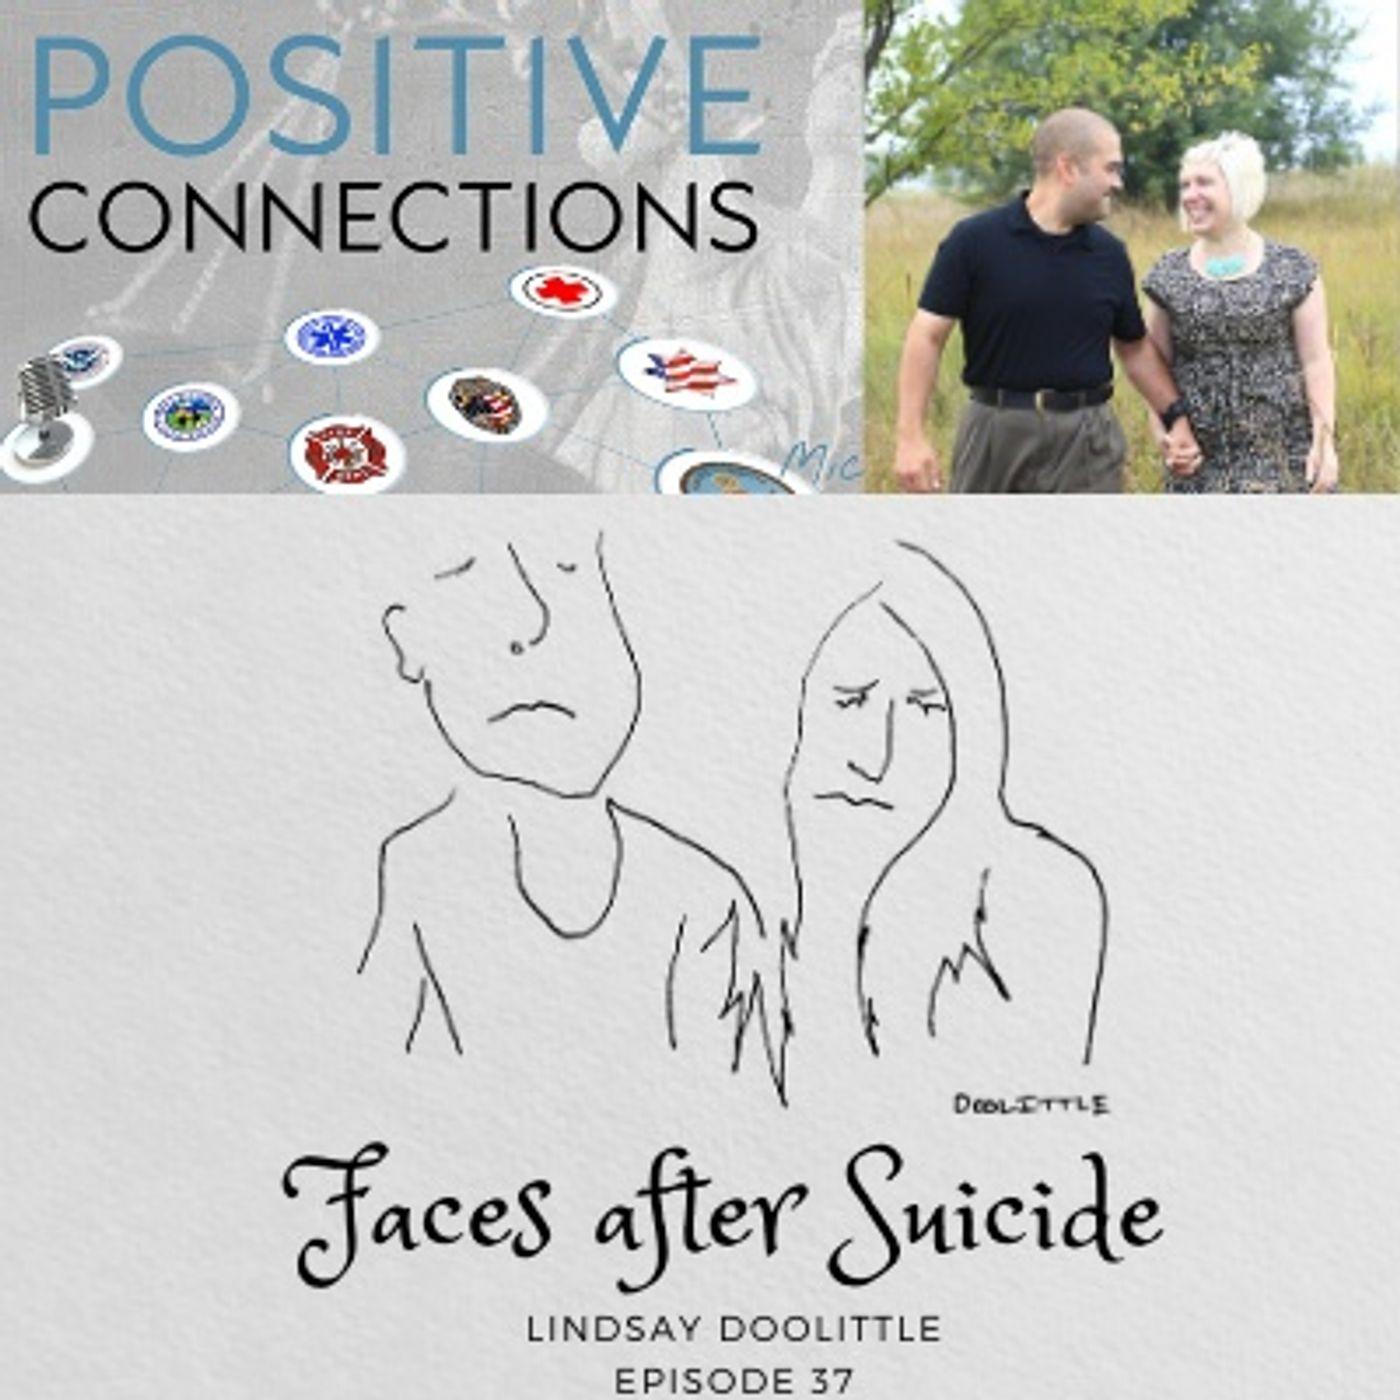 Faces after Suicide: Lindsay Doolittle